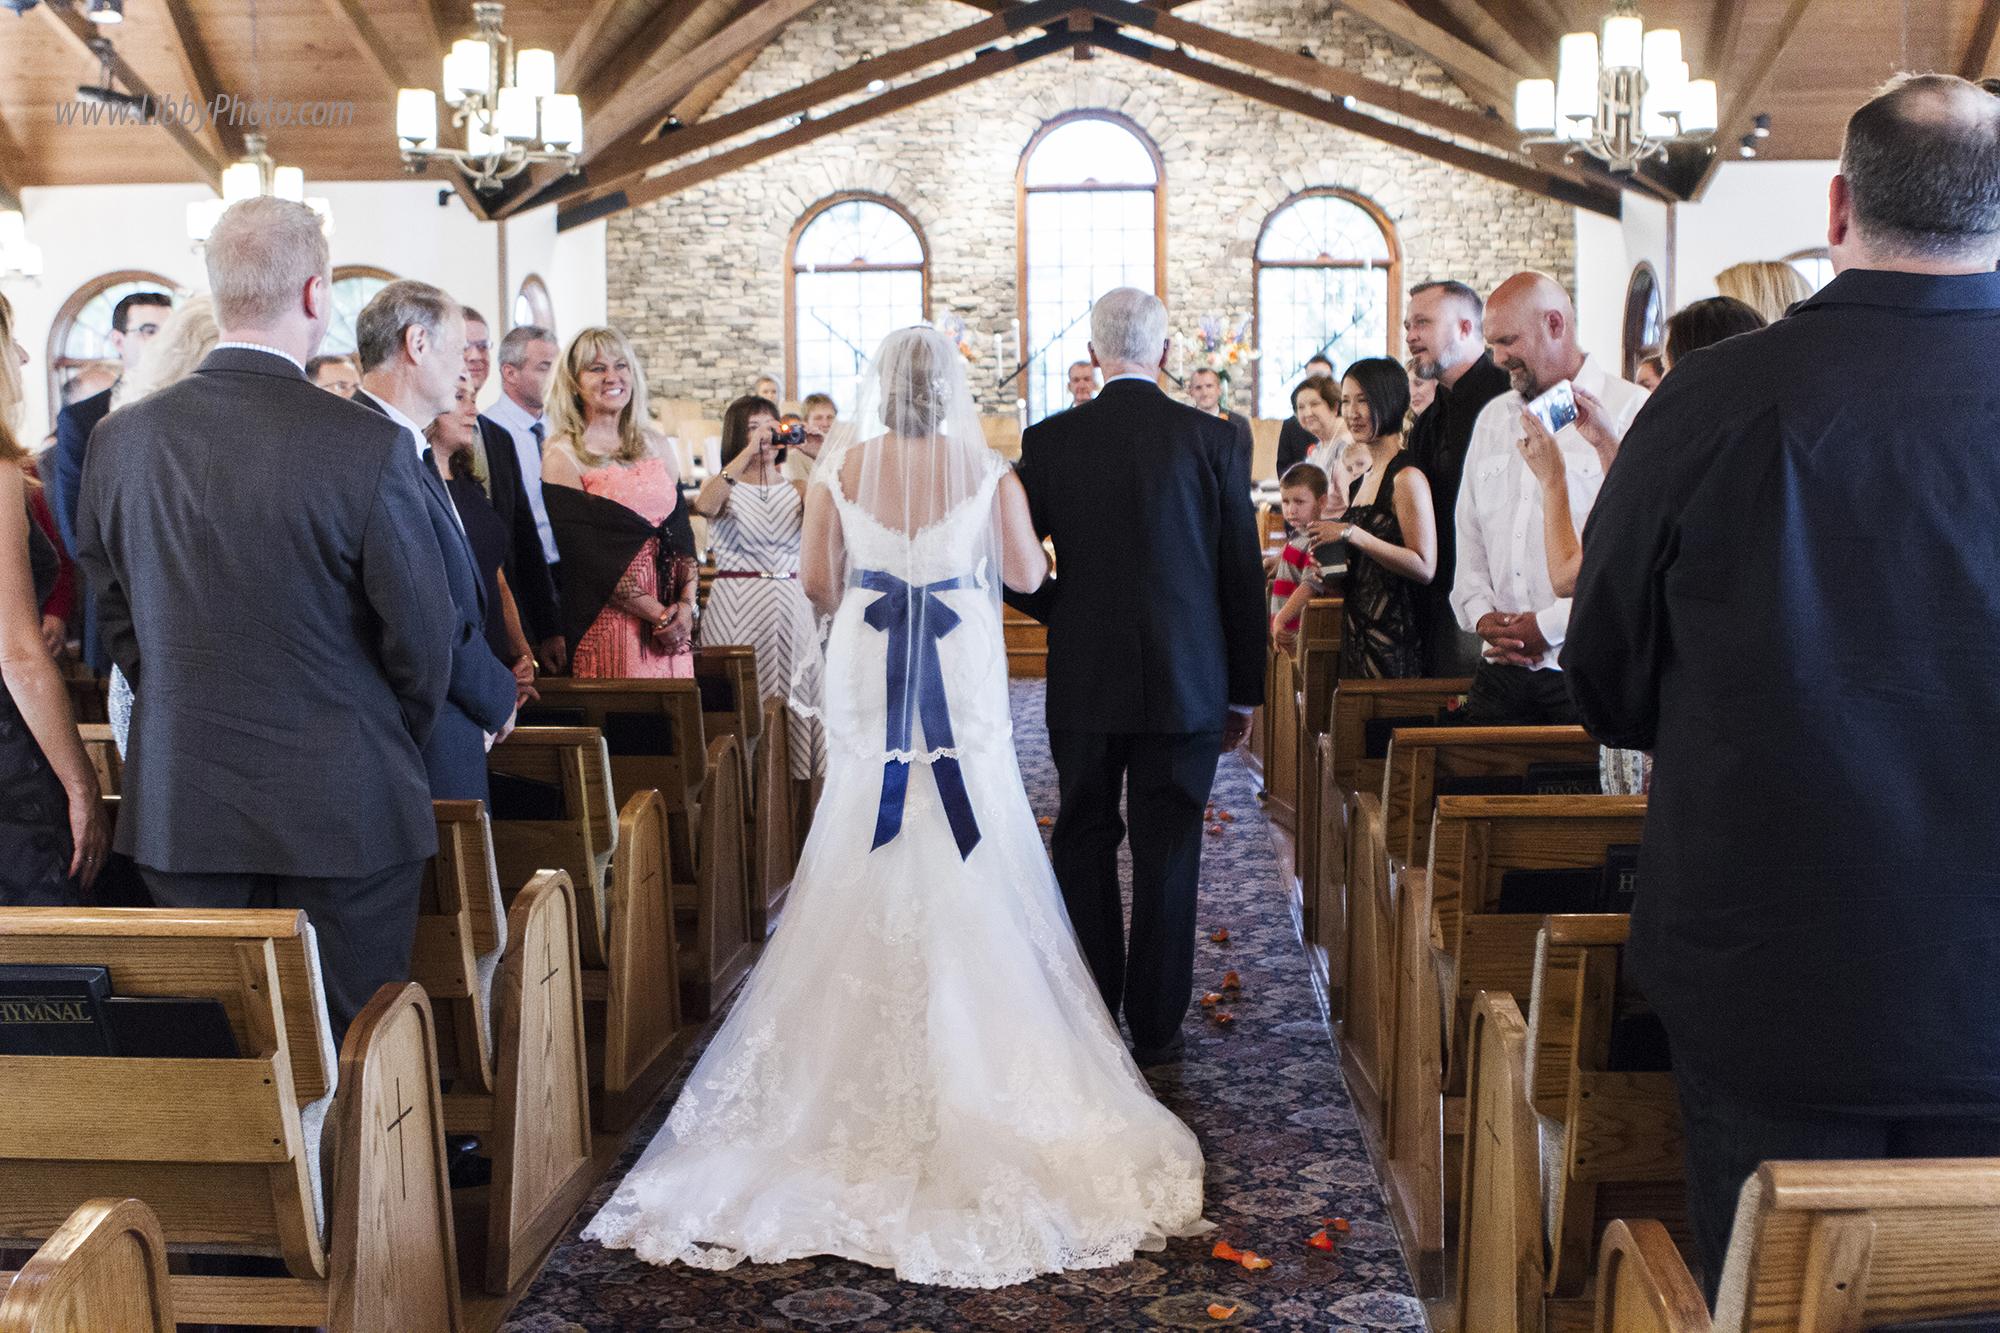 Atlanta wedding photography, Libbyphoto11 (5).jpg